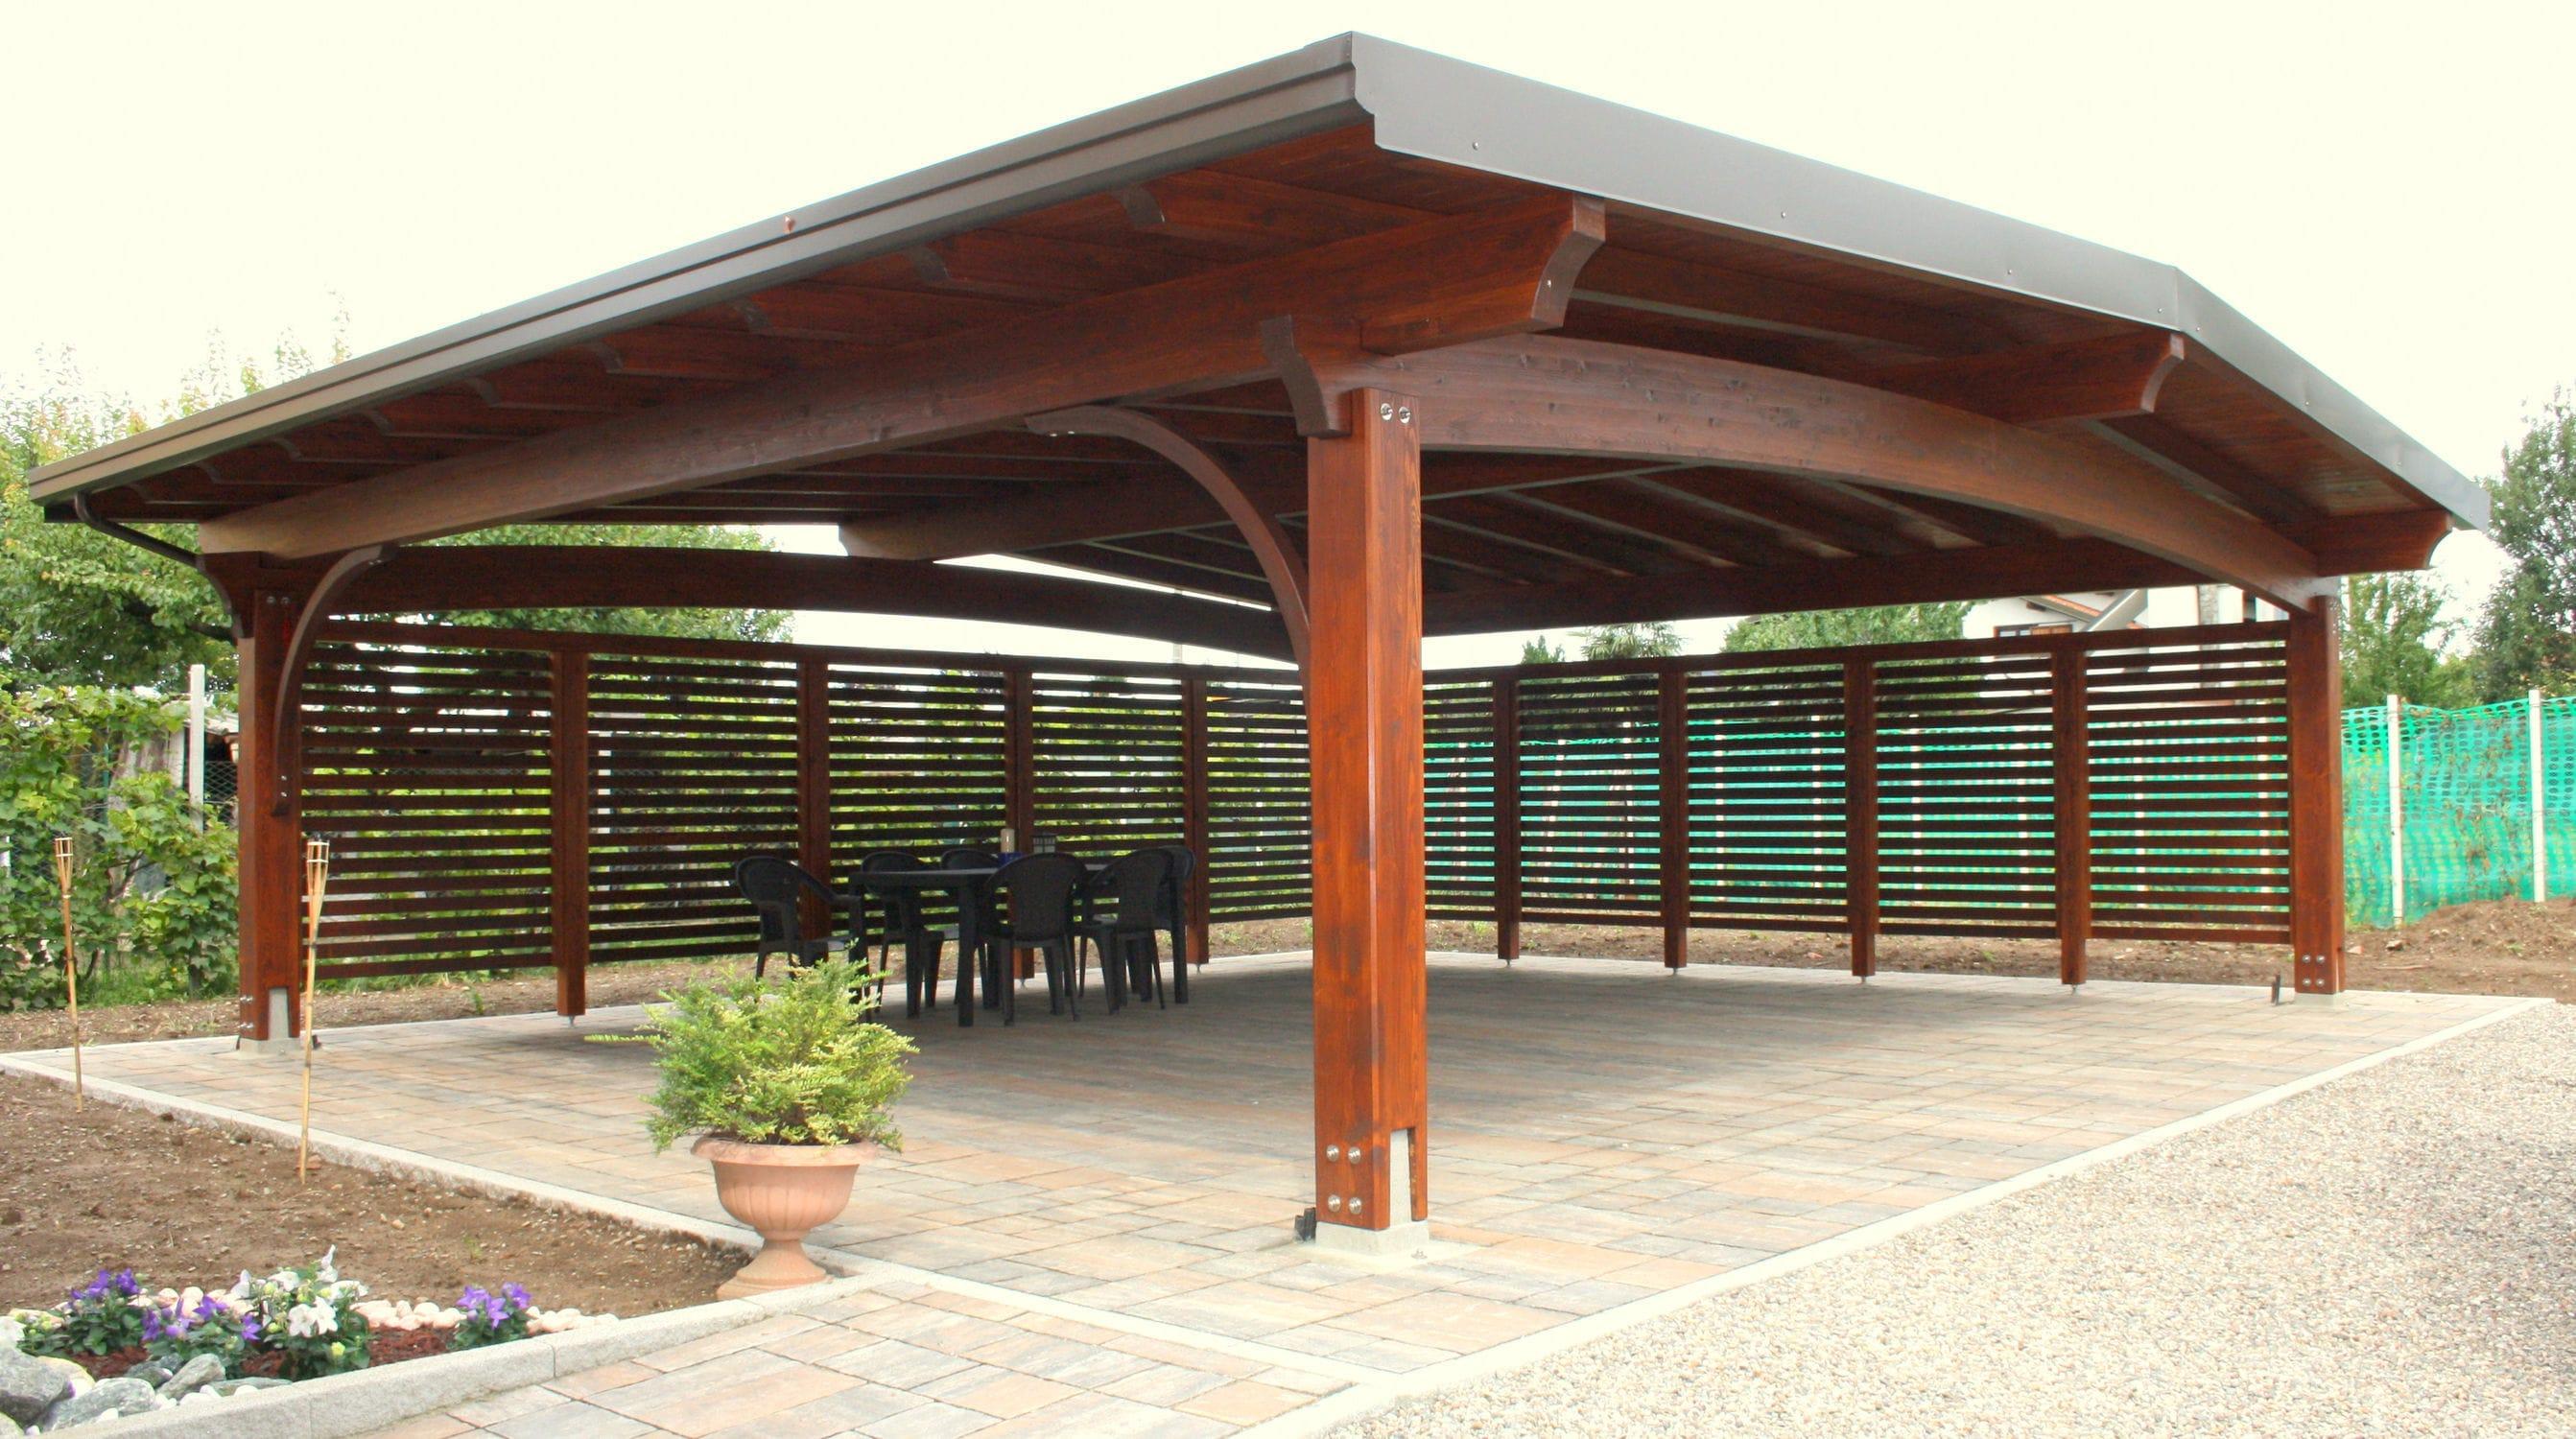 Holz-Carport - ARCO - Proverbio Outdoor Design